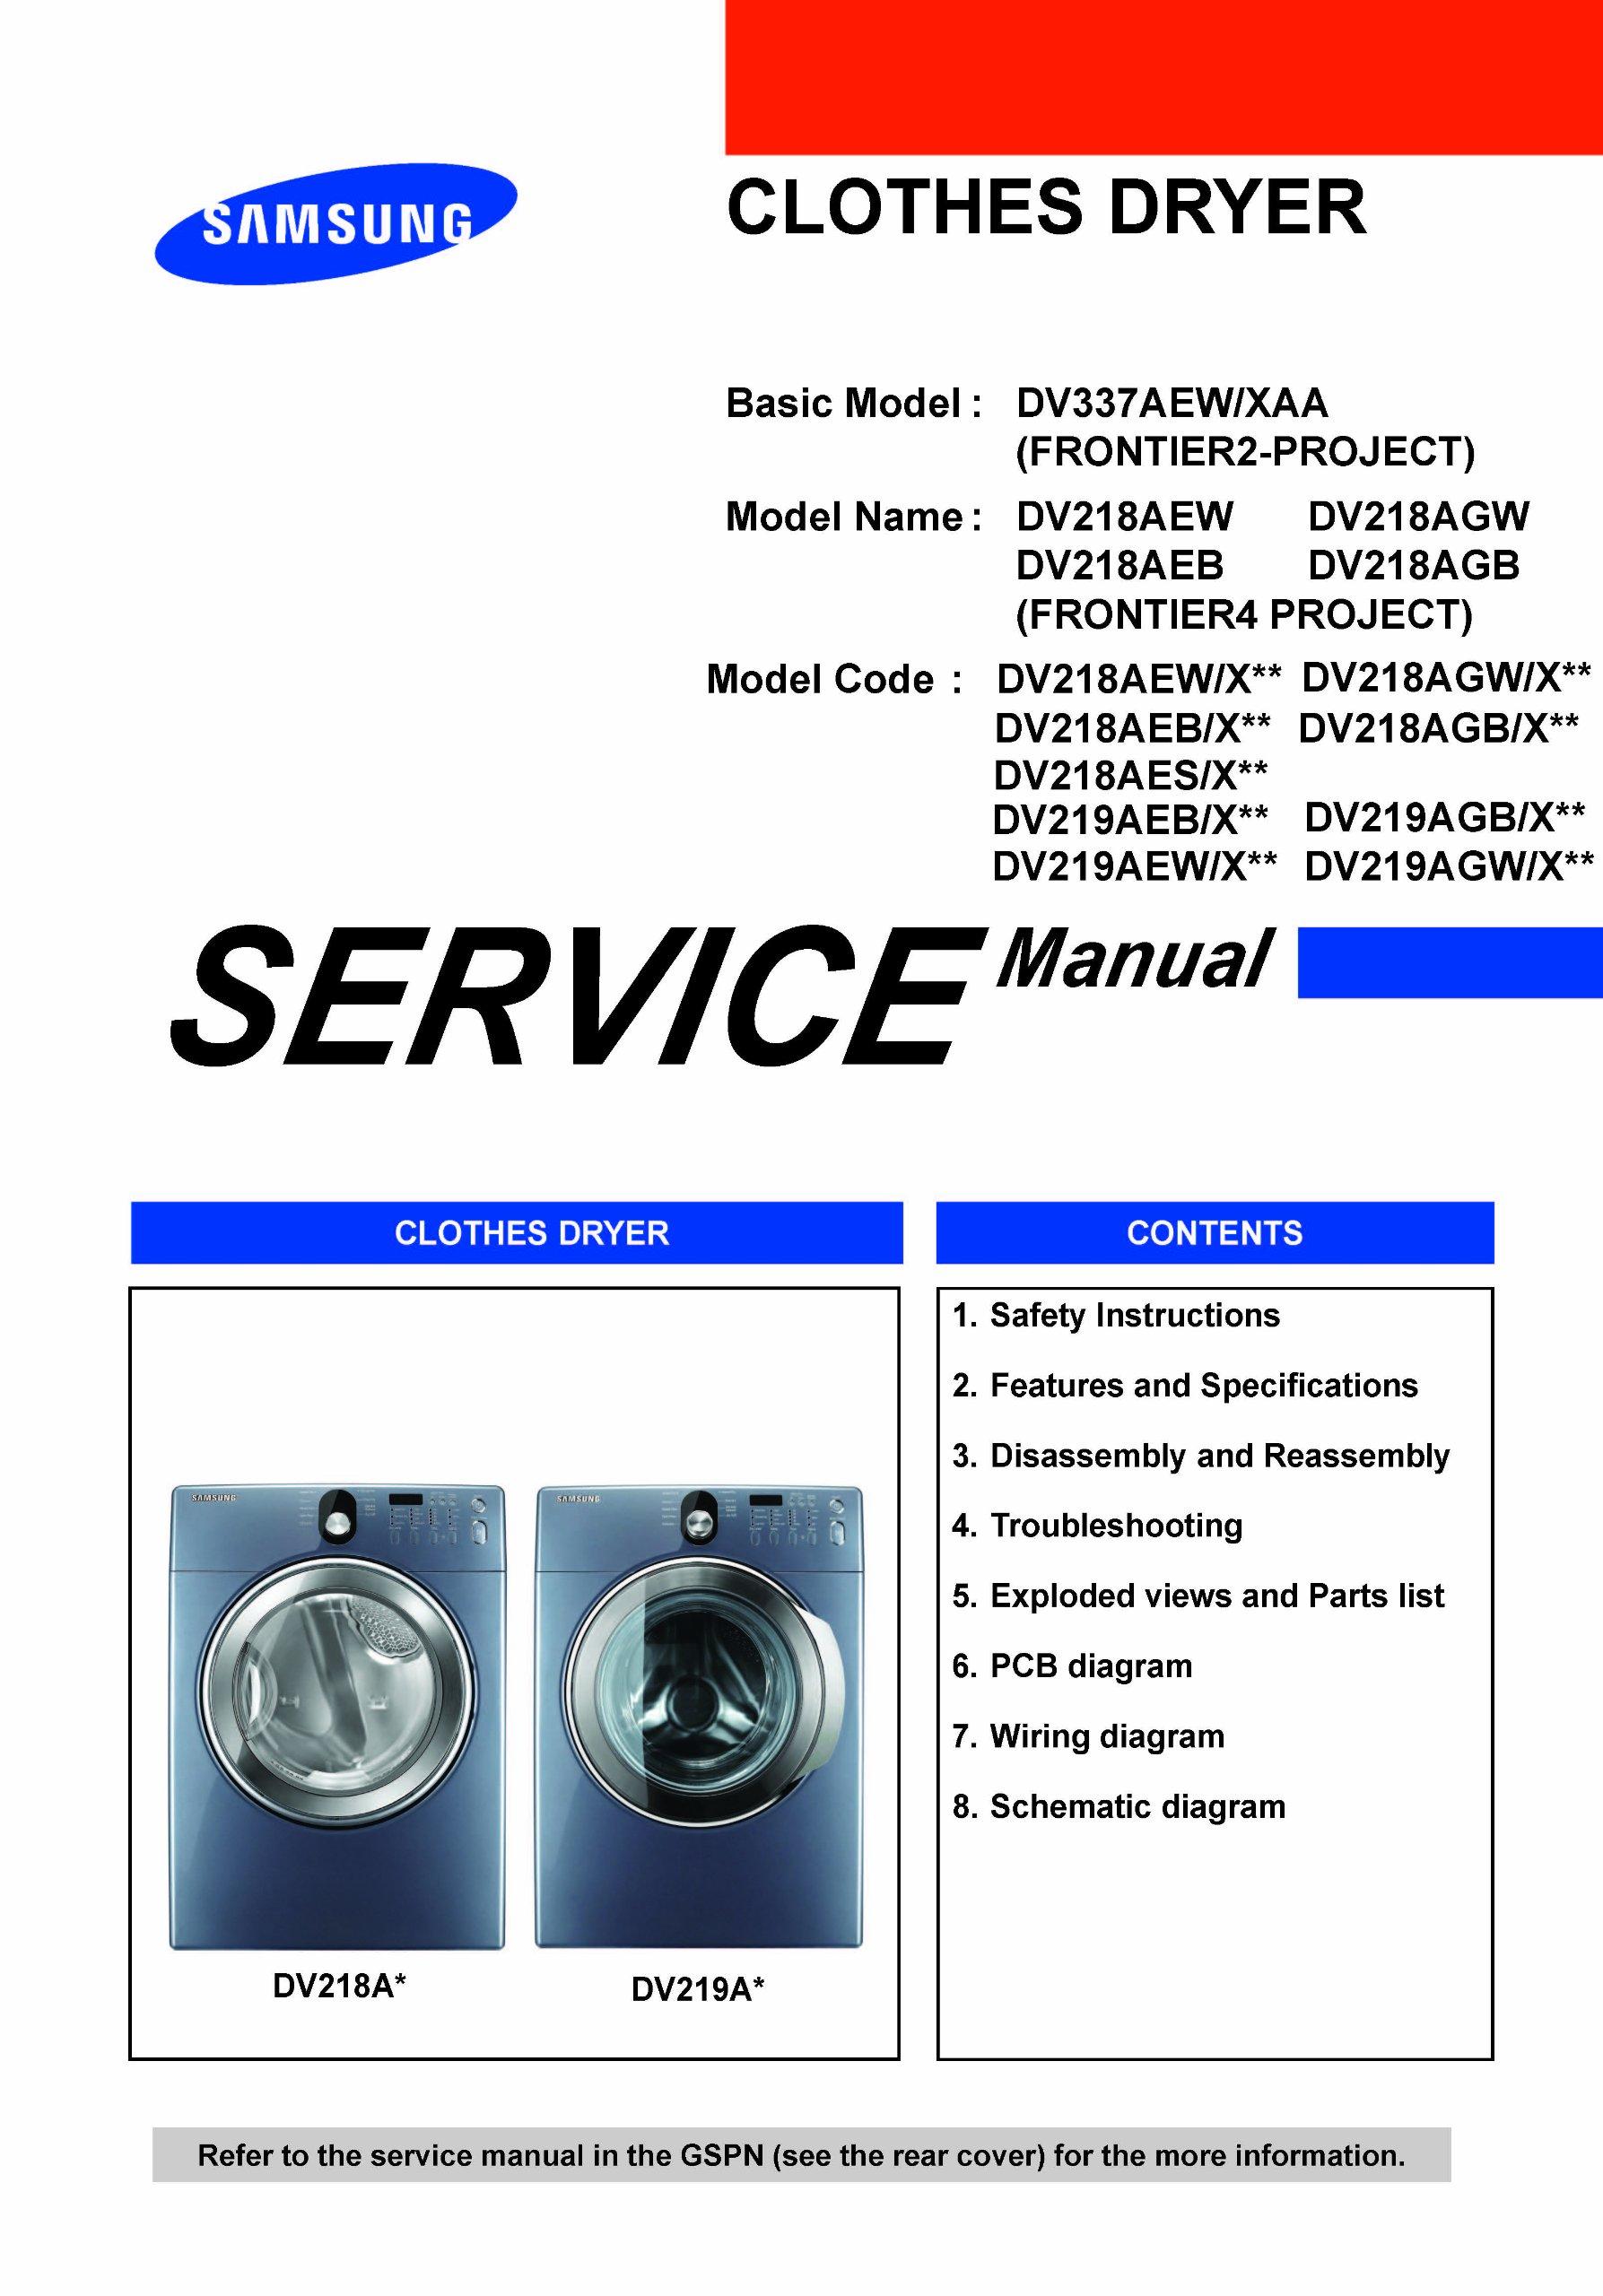 samsung dv219aew xaa service manua dv218aew xaa service manual rh amazon com Guitar Wiring Schematics Wiring Schematic Symbols